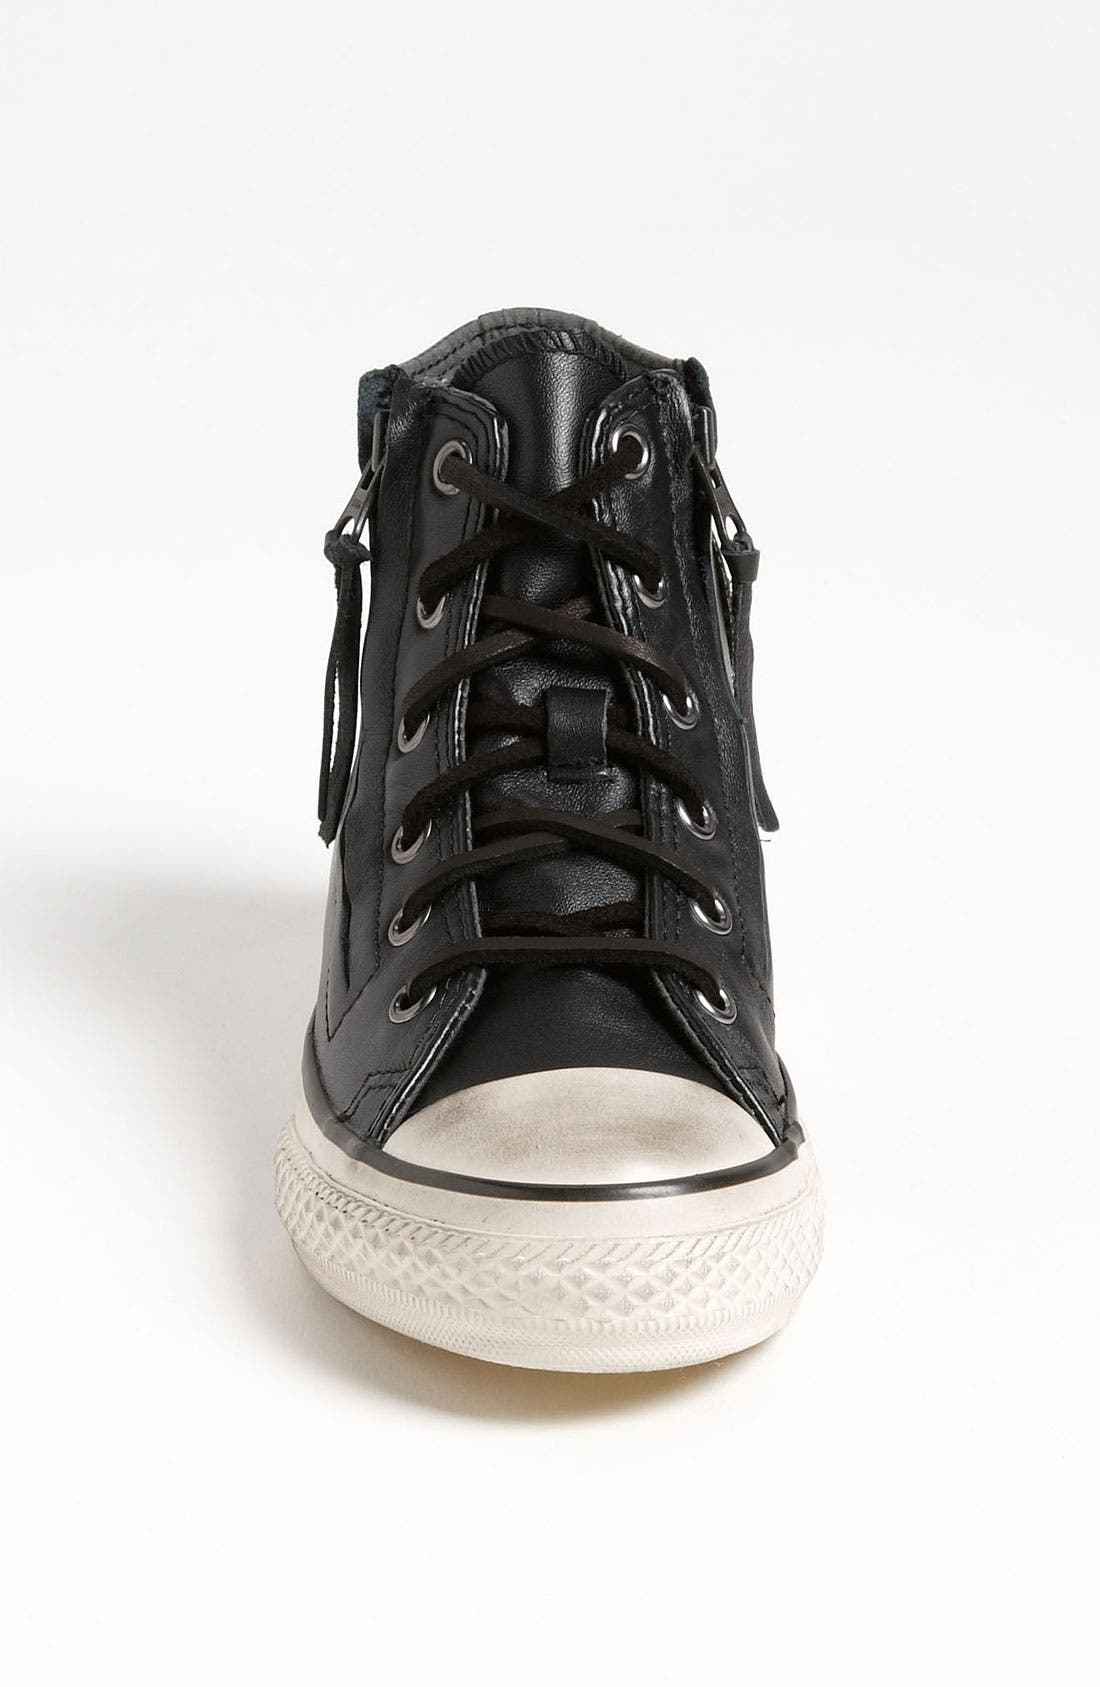 Alternate Image 3  - Converse by John Varvatos 'Double Zip' High Top Sneaker (Toddler, Little Kid & Big Kid)